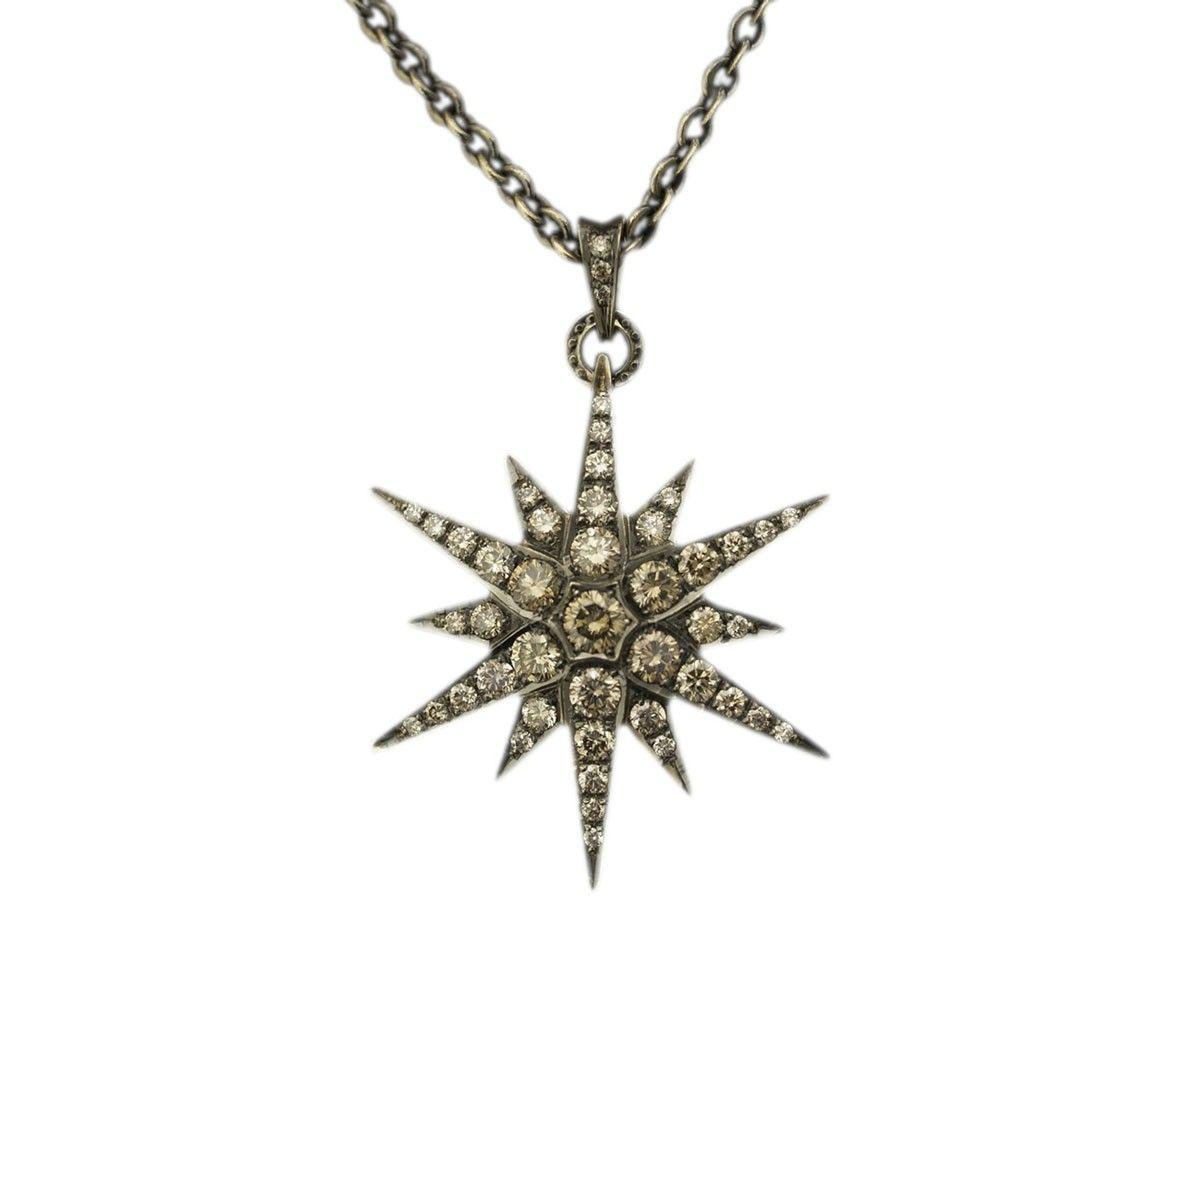 Hern 18k diamond star pendant necklace jewelry pinterest hern 18k diamond star pendant necklace aloadofball Choice Image